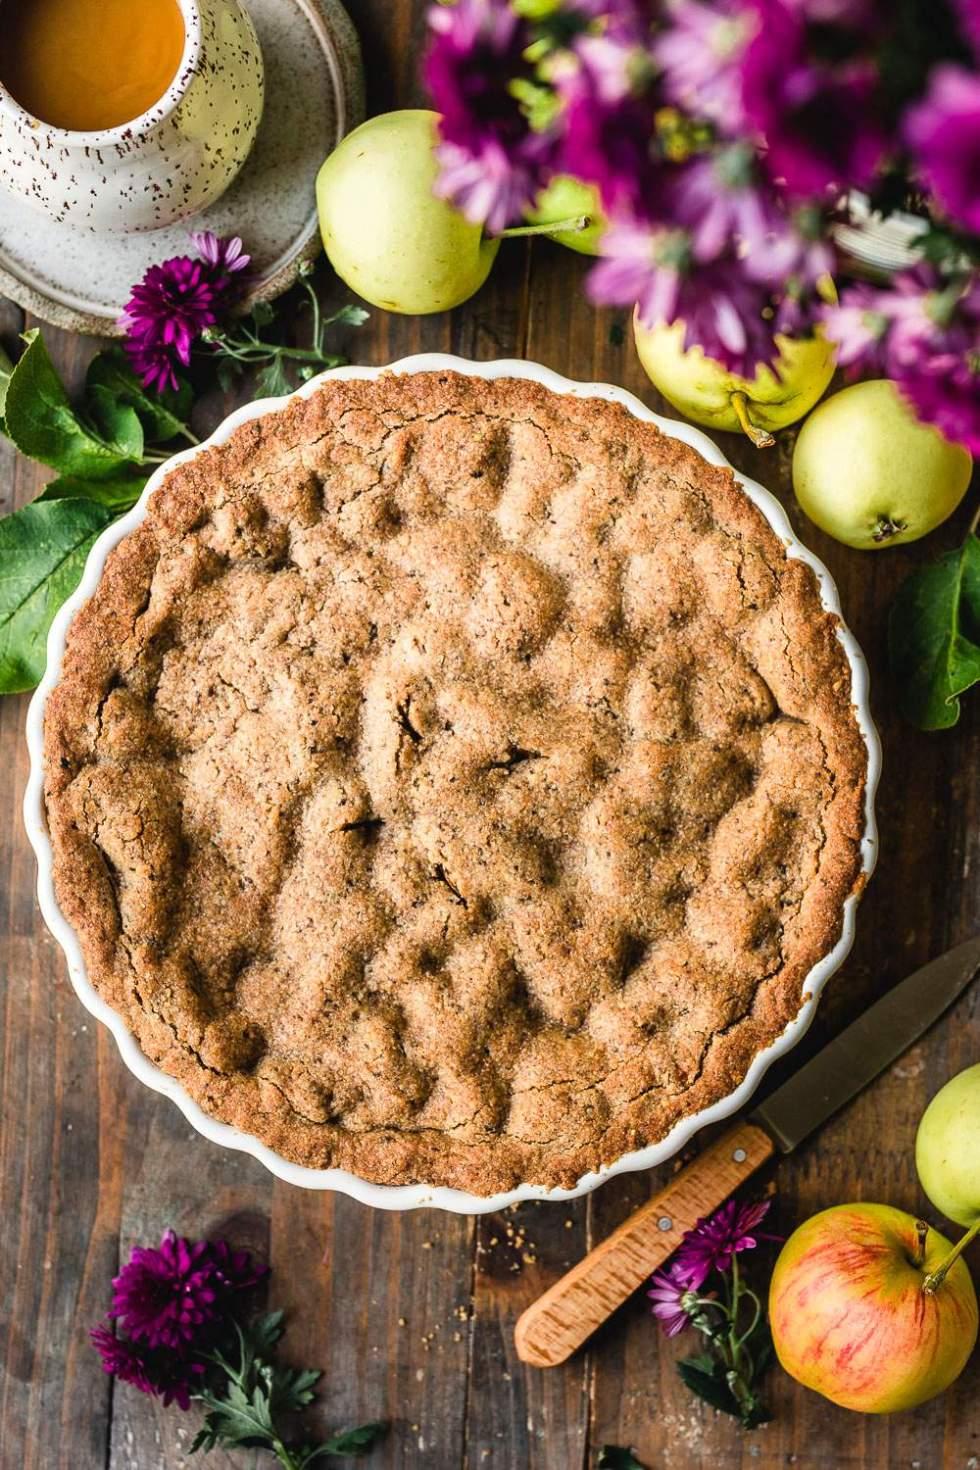 Vegan apple pie with buckwheat crust